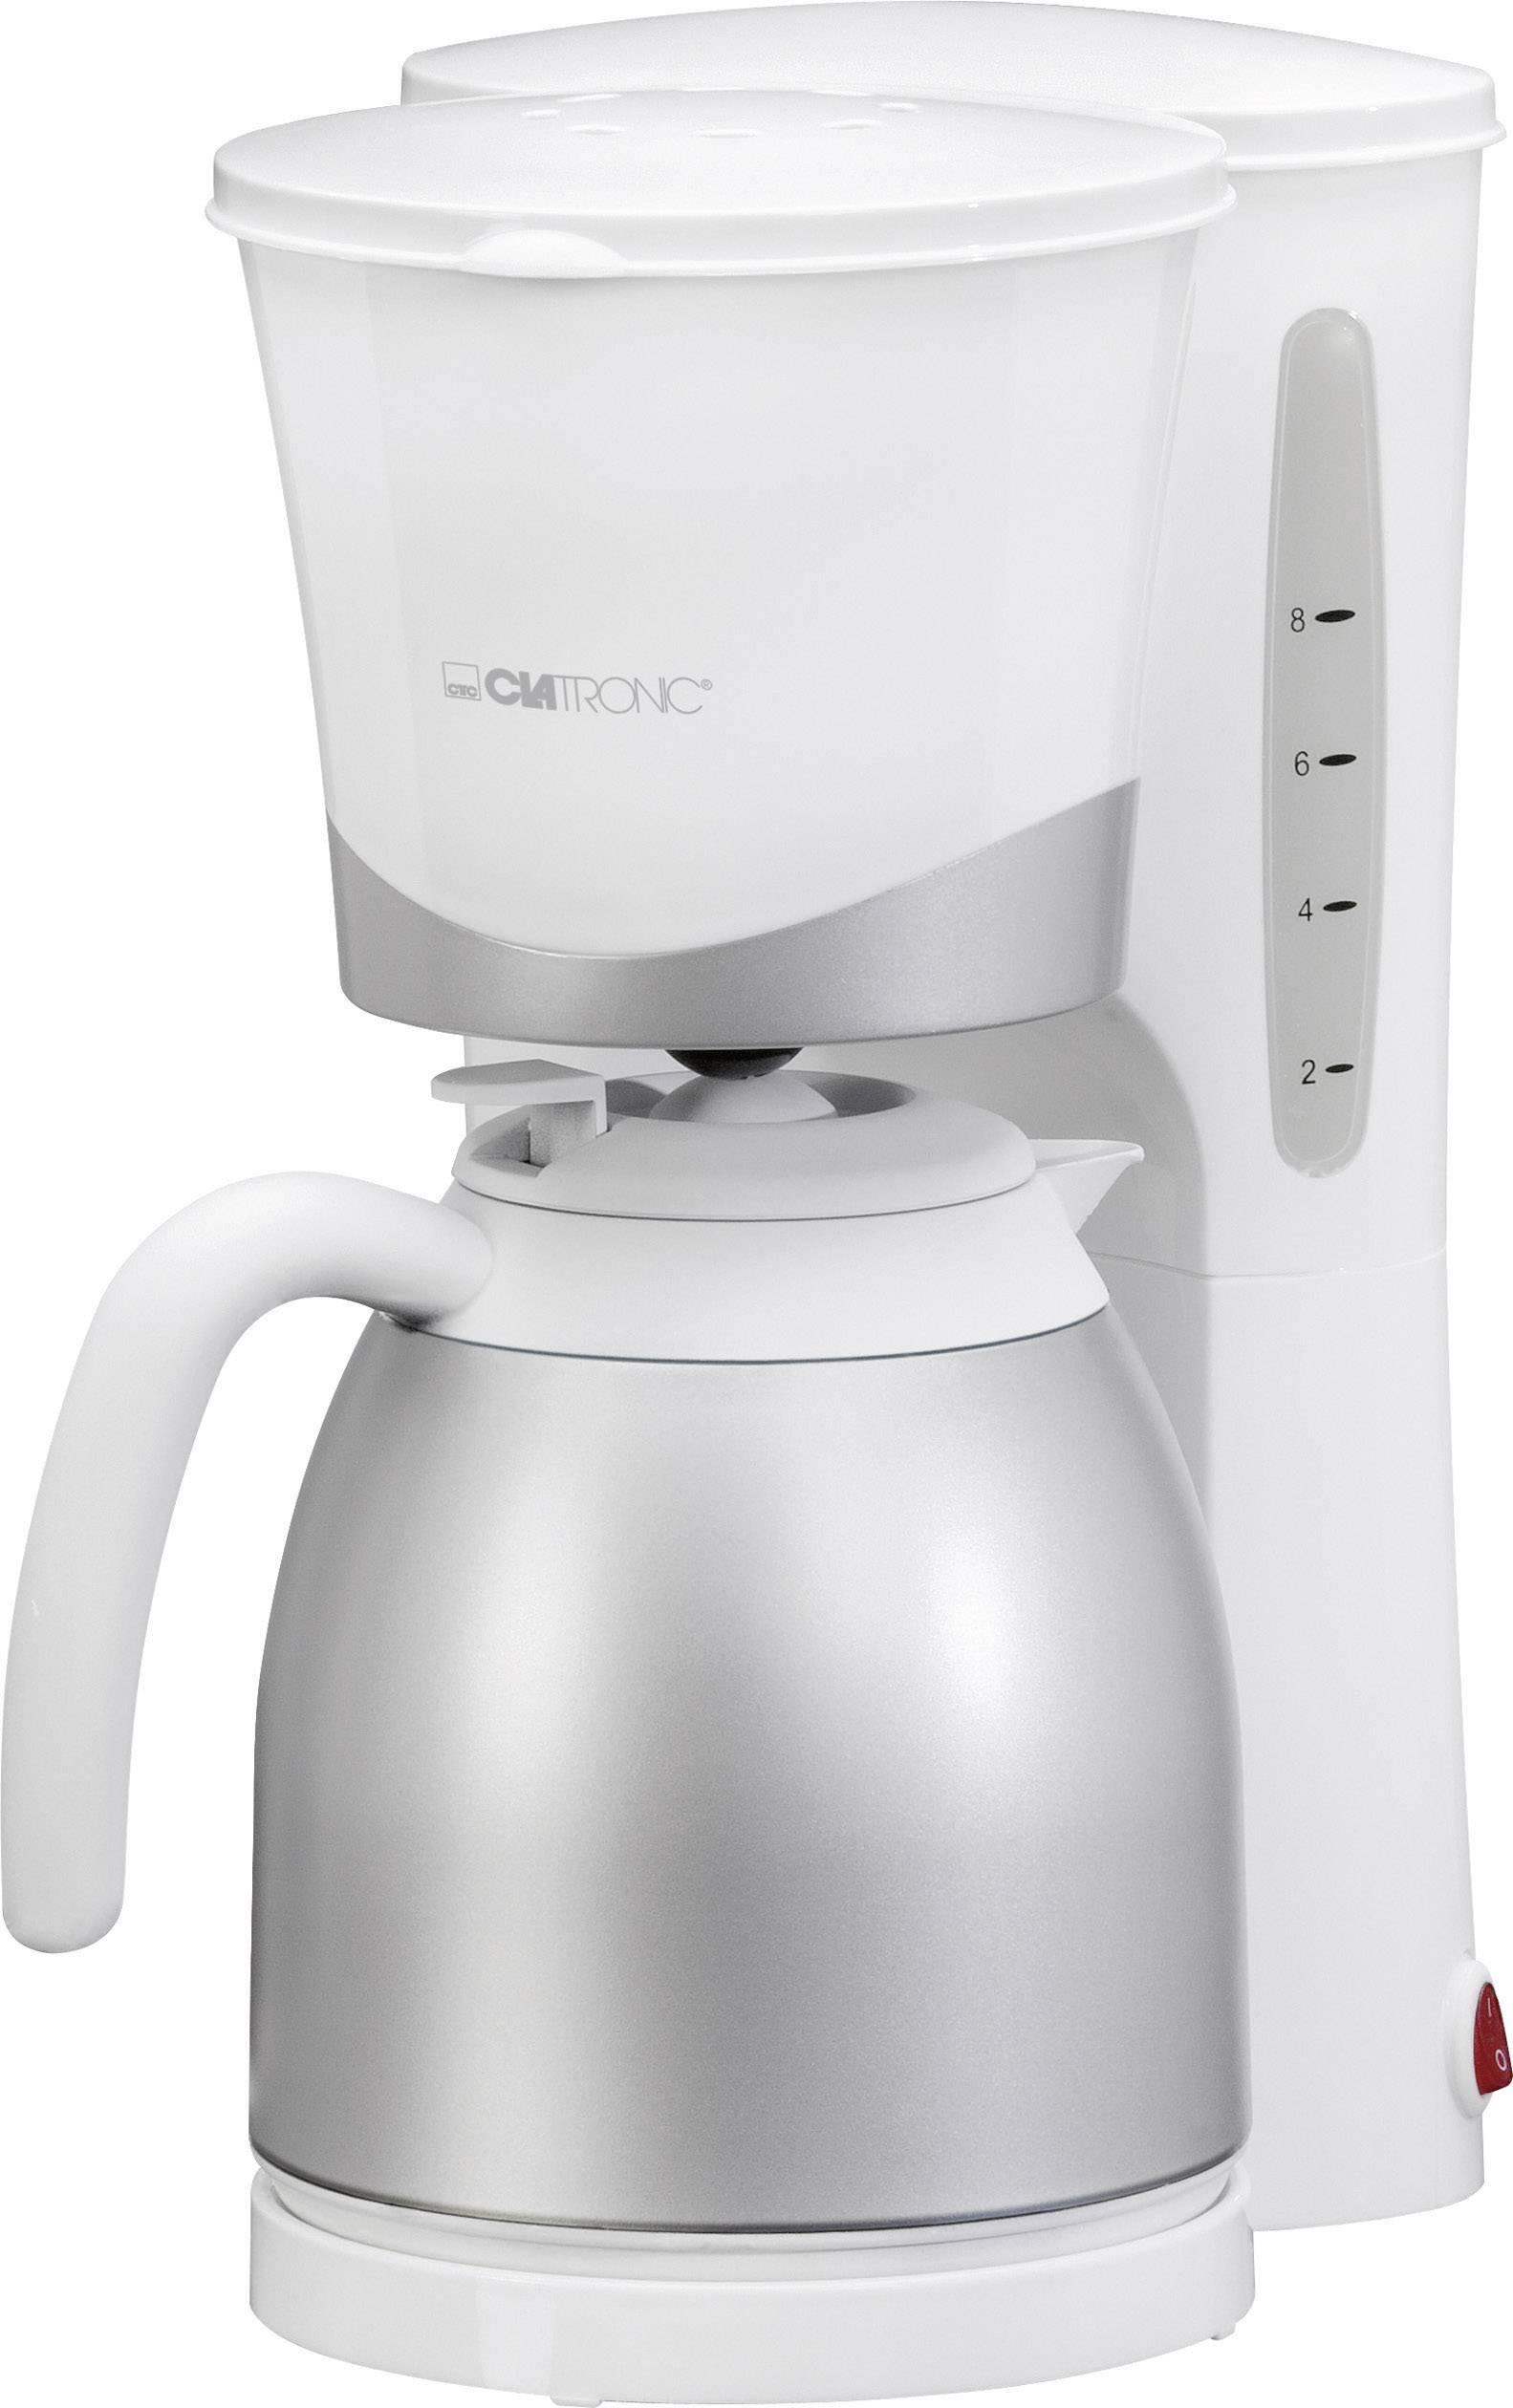 Kávovar Clatronic KA 3327, biela